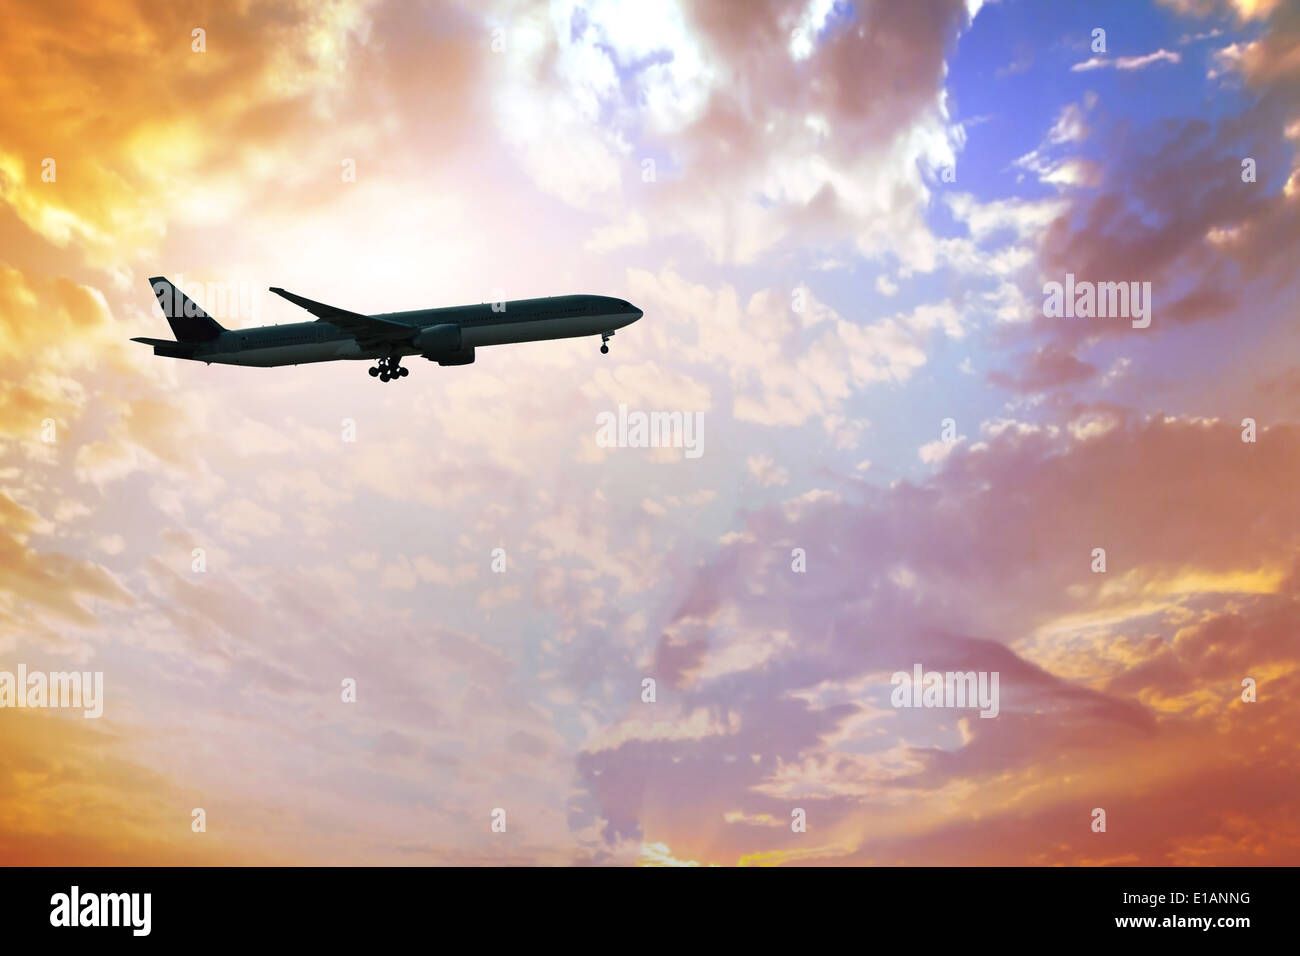 Silhouette des Flugzeugs bei Sonnenuntergang Himmel Stockbild